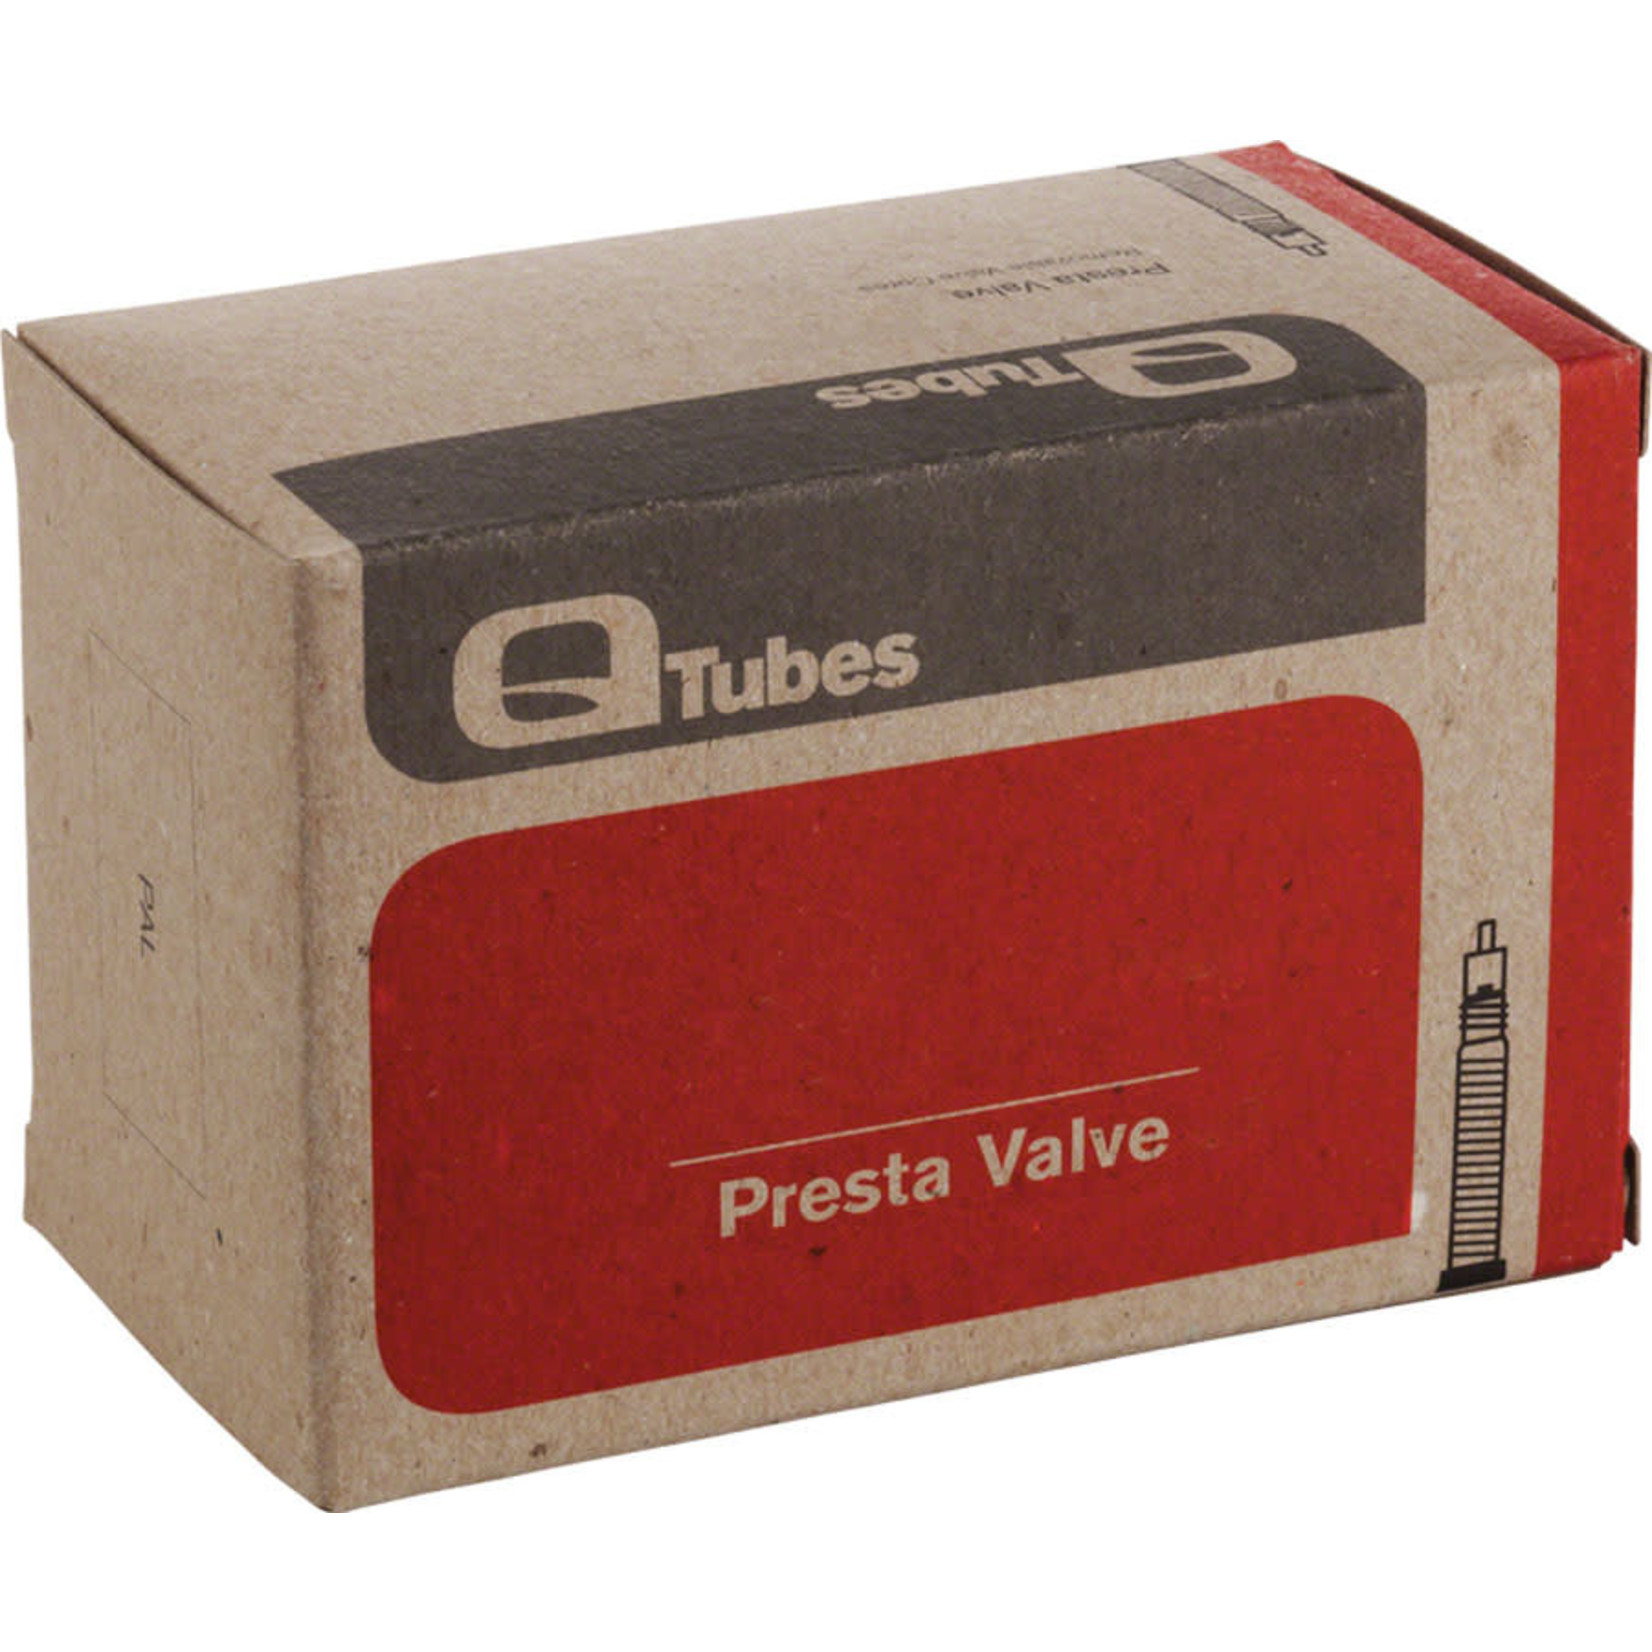 "Q-Tubes Q-Tubes Superlight 29"" x 1.9-2.3"" 48mm Presta Valve Tube"